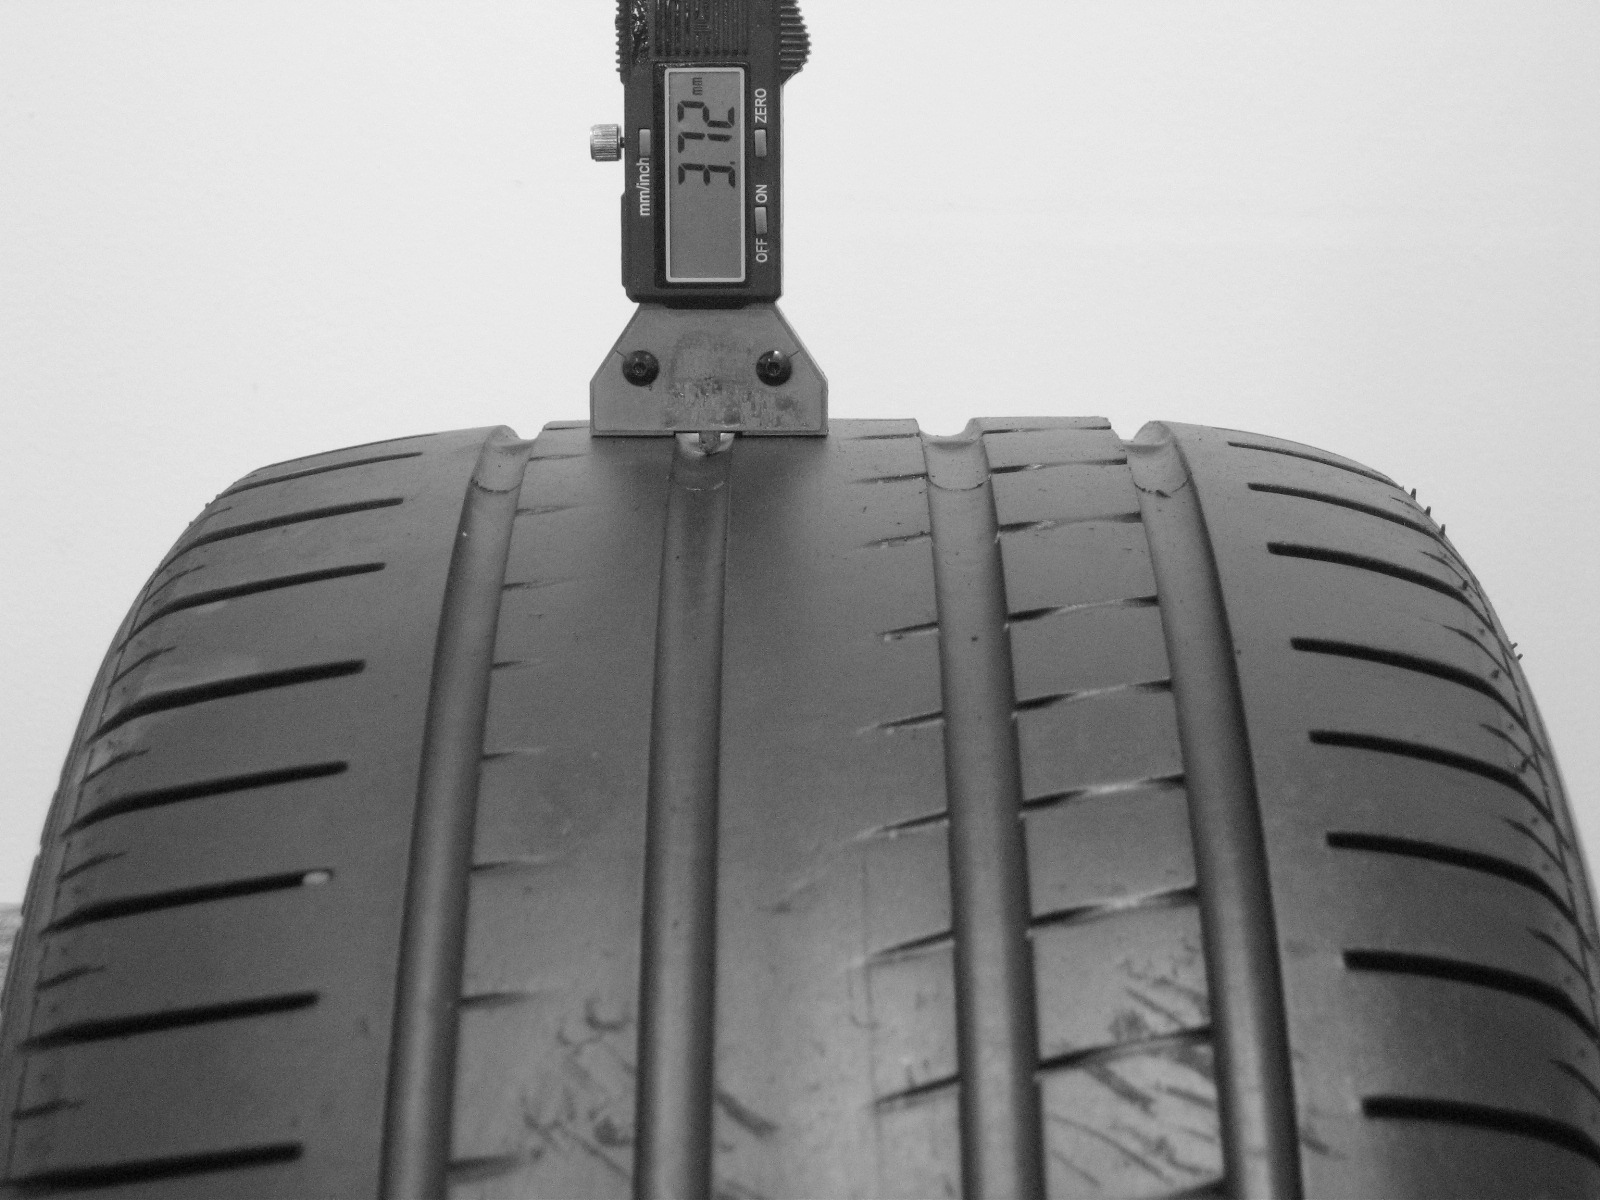 Použité-Pneu-Bazar - 255/40 R19 PIRELLI P ZERO ROSSO -kusovka-rezerva 3mm